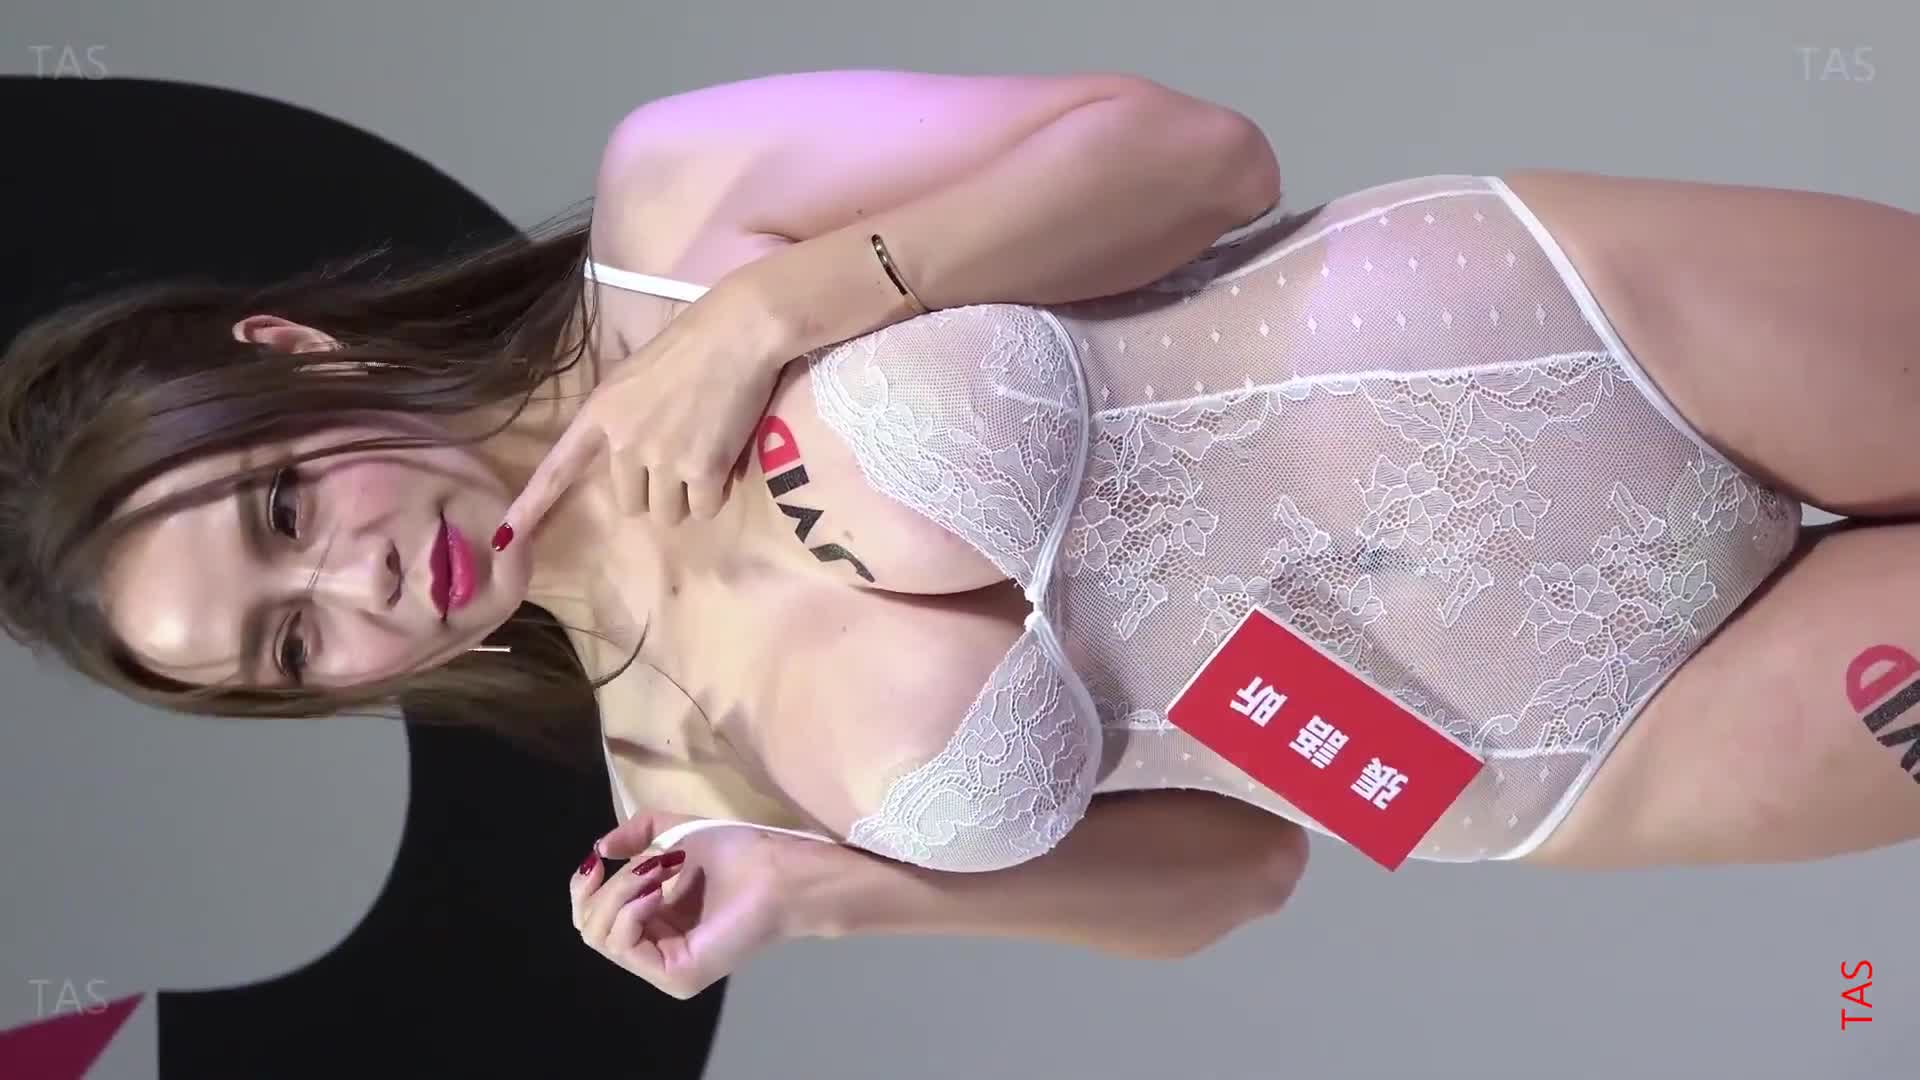 Taipei JVID Model CHUBBY HOT 2019 - Taipei International Adult Exhibition 2019